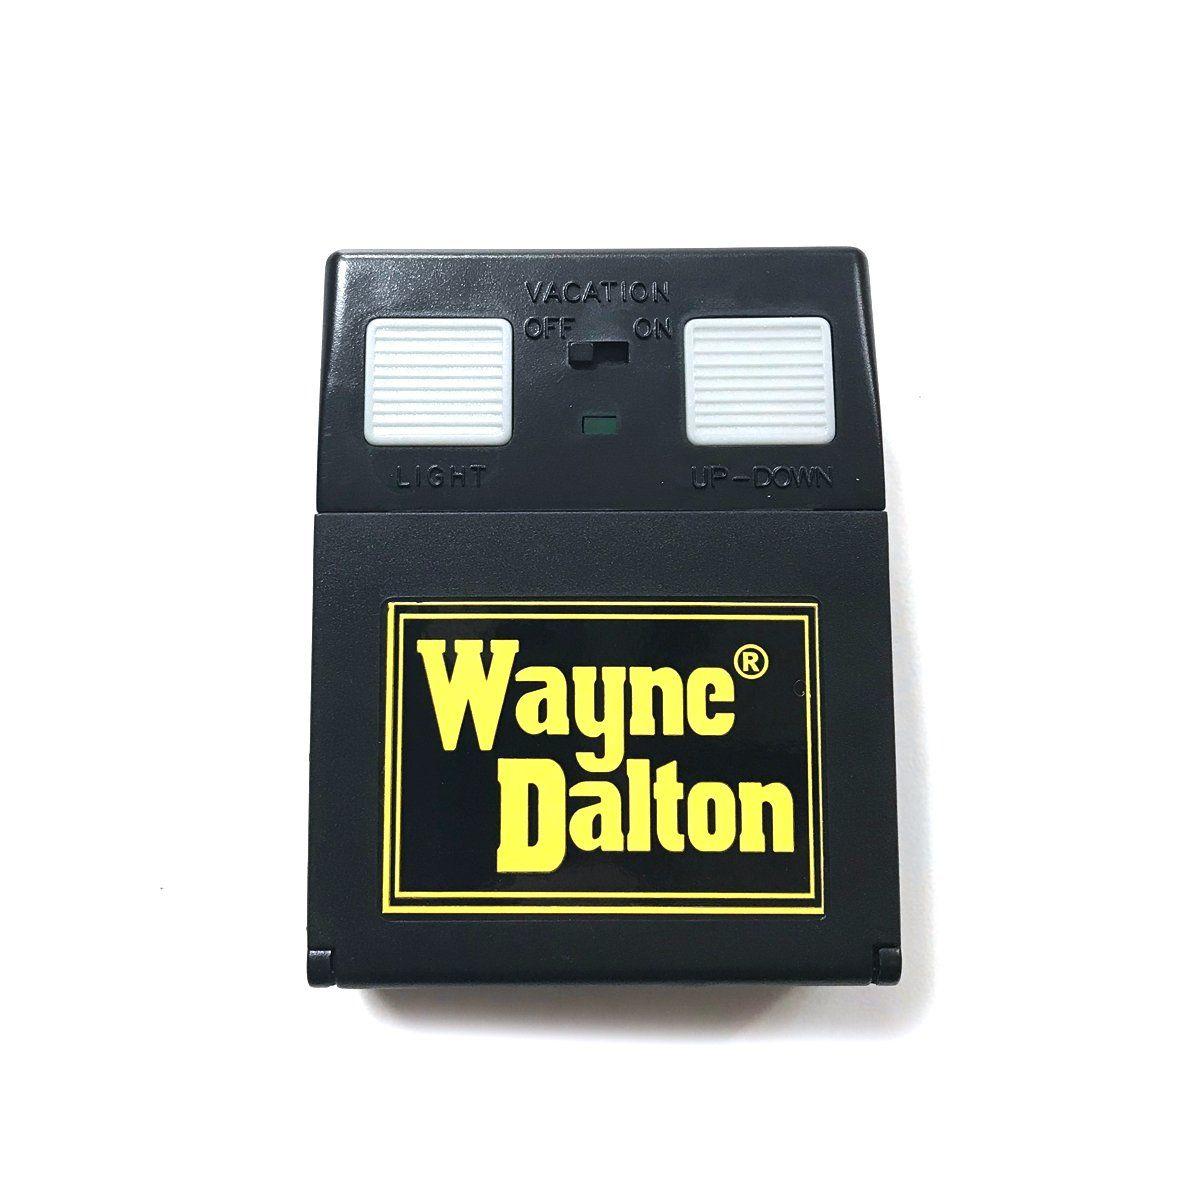 wayne dalton wireless wall station 297136 303 mhz wayne dalton garage doors garage door opener [ 1200 x 1200 Pixel ]